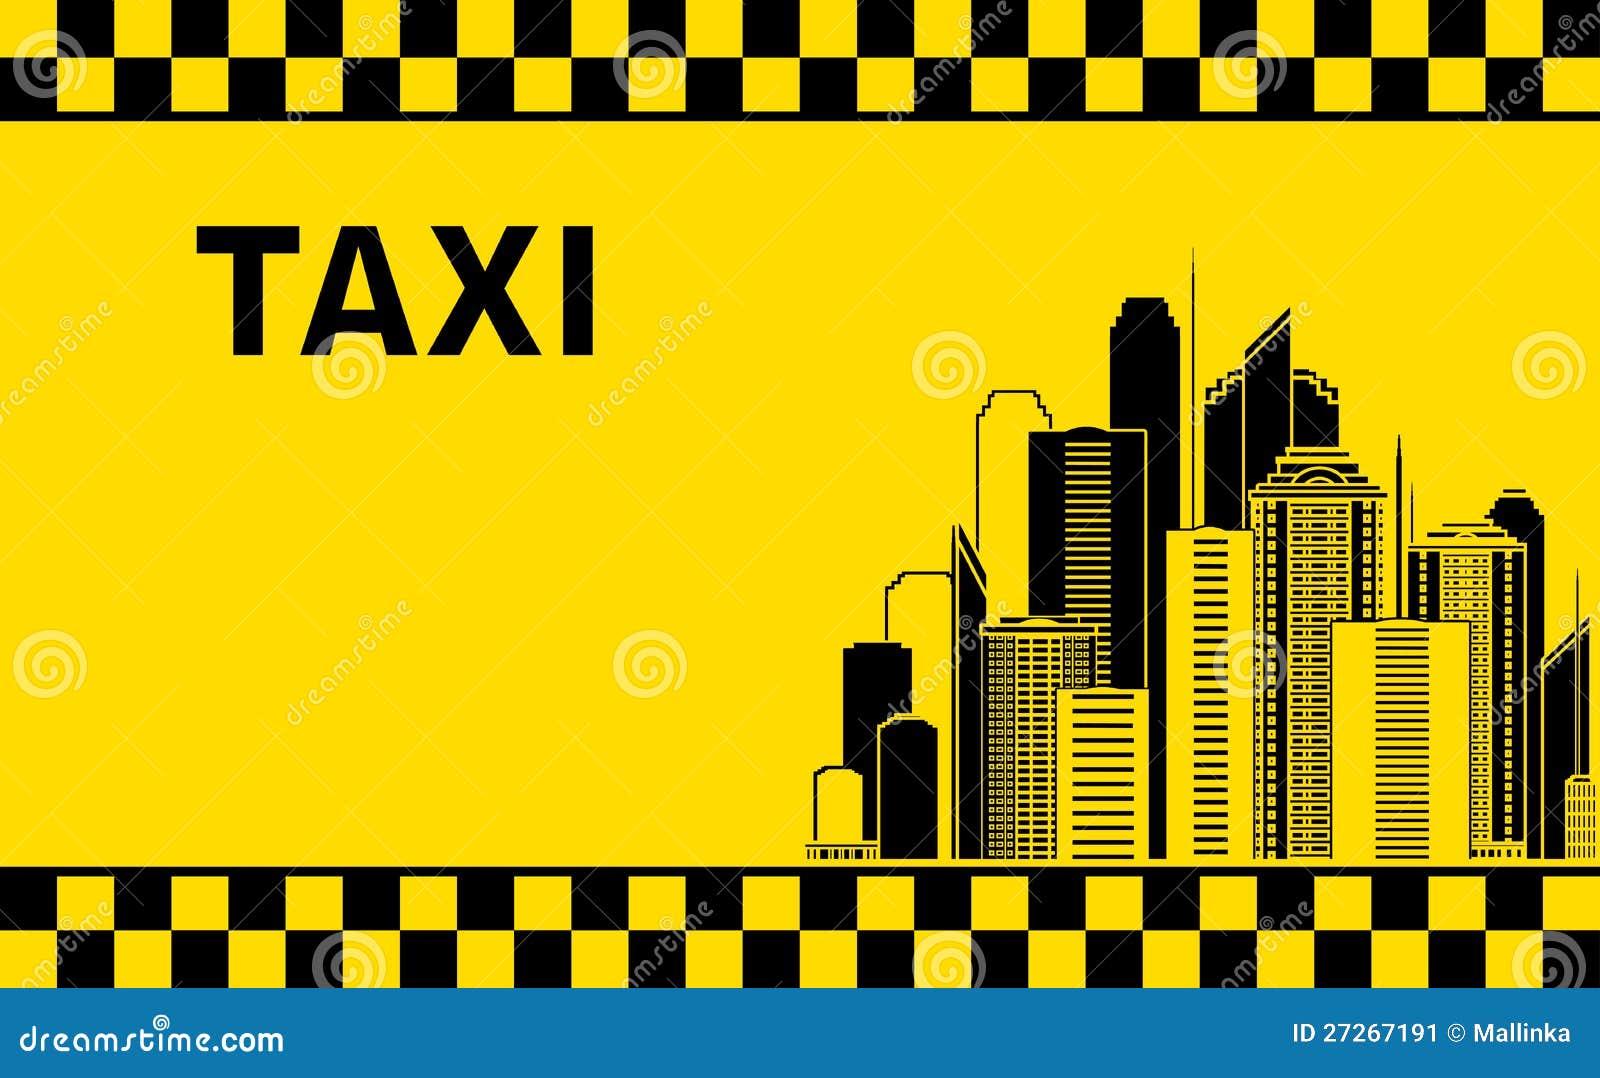 Stock Image Taxi Background City Landscape Image27267191 on 2d Floor Plan Design